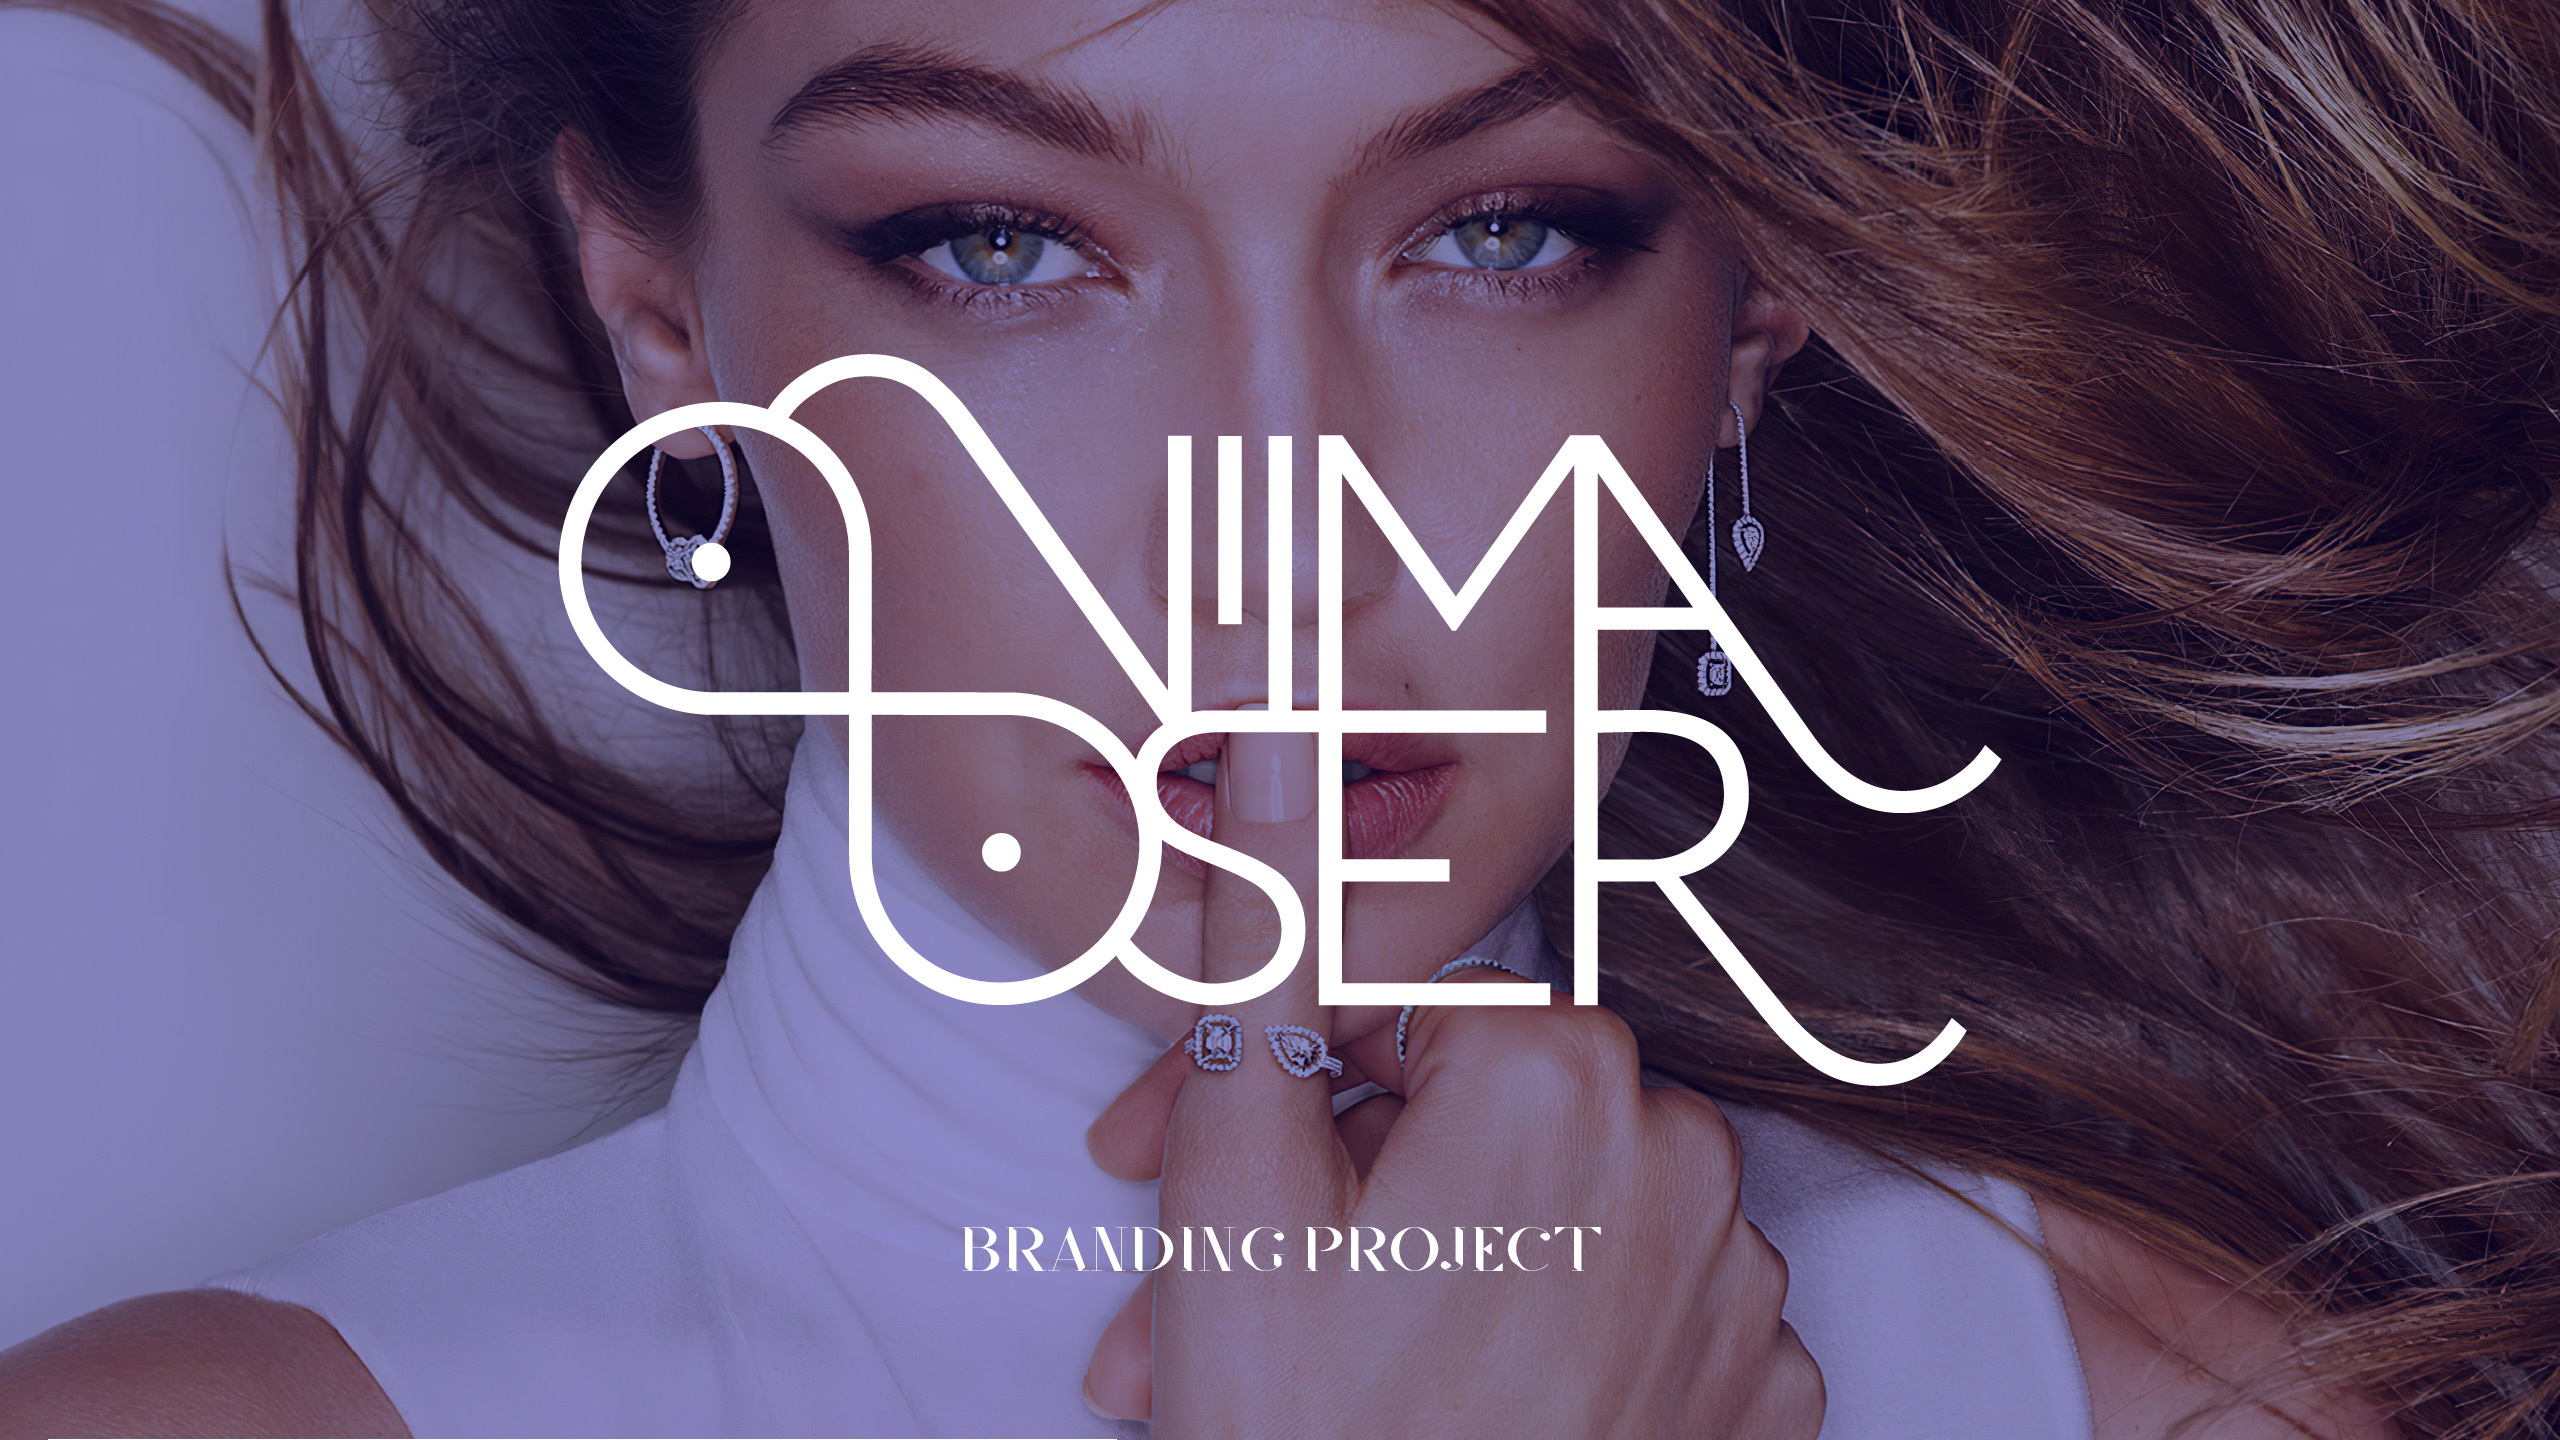 Vilma Ser Branding 3 / Logobou design